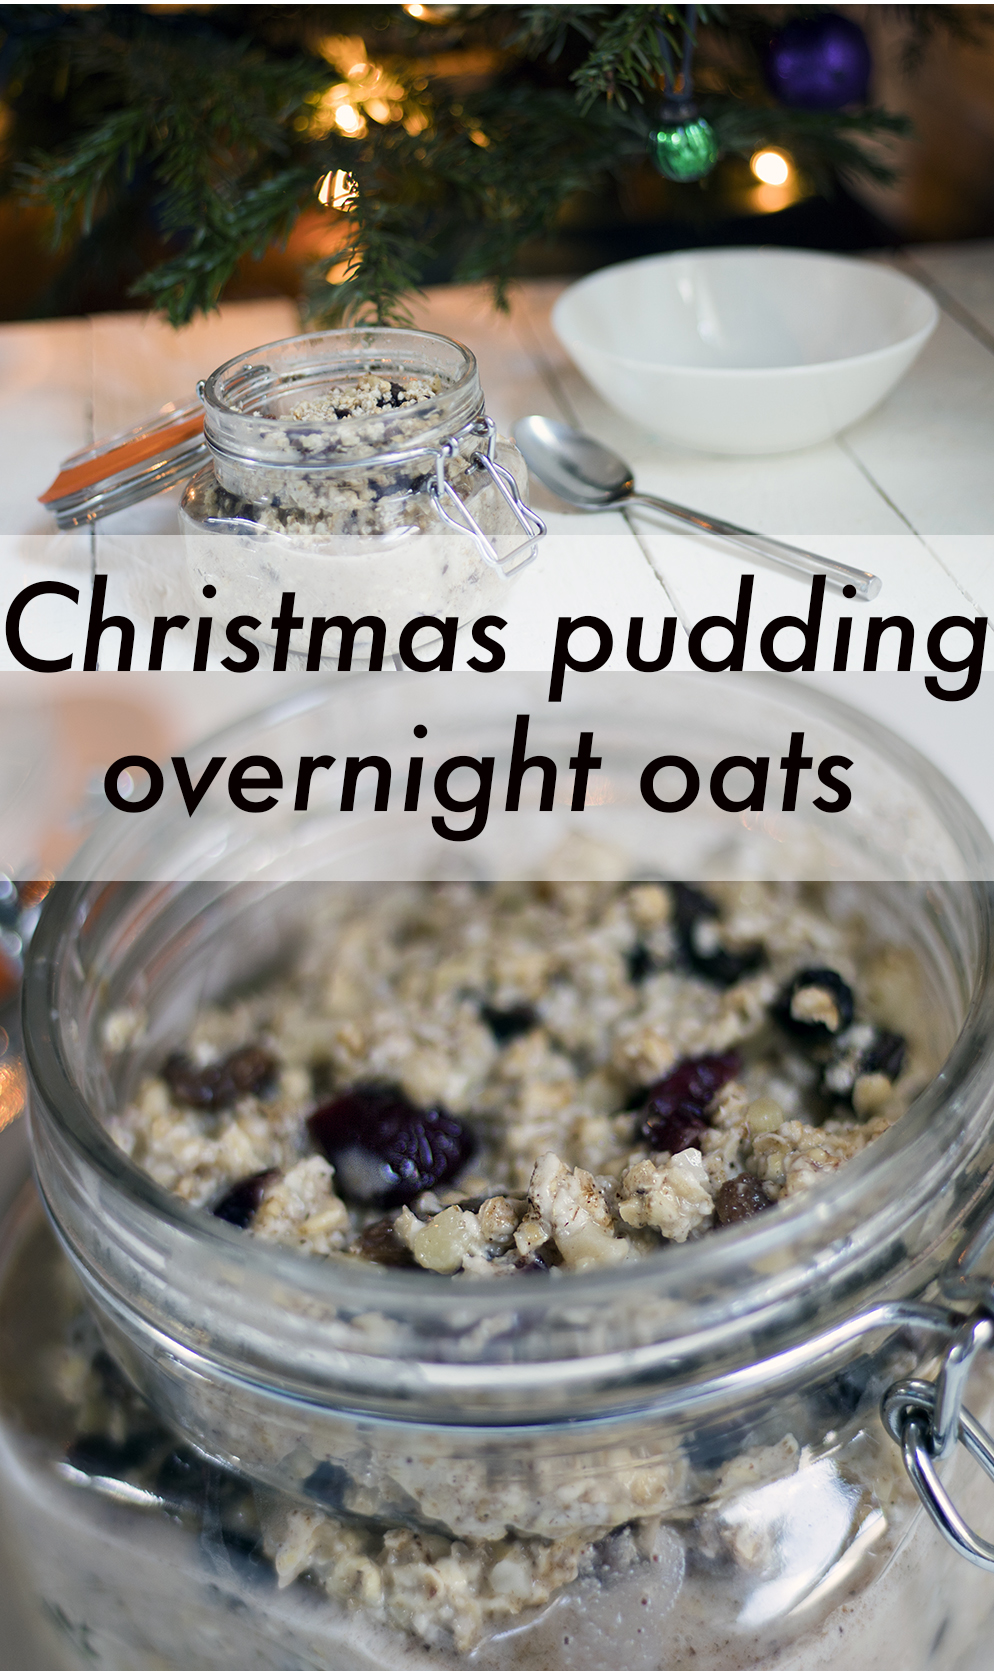 Christmas-pudding-overnight-oats-recipe-portrait.jpg